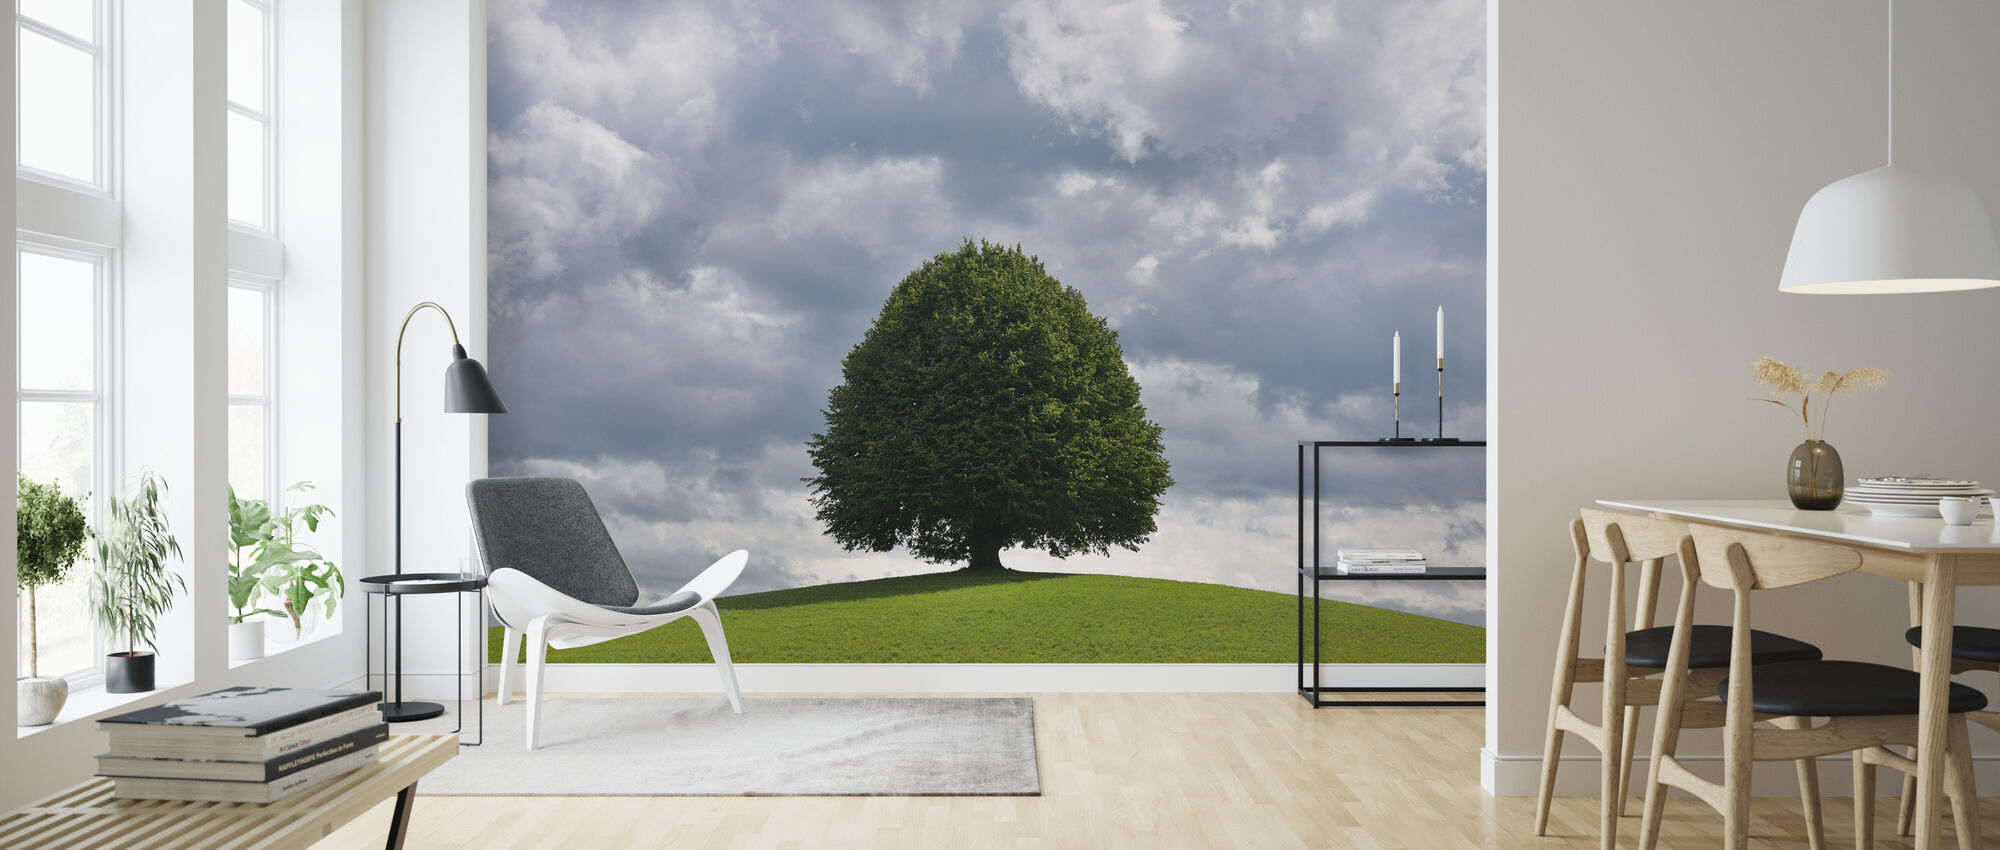 Lime Tree - Wallpaper - Living Room